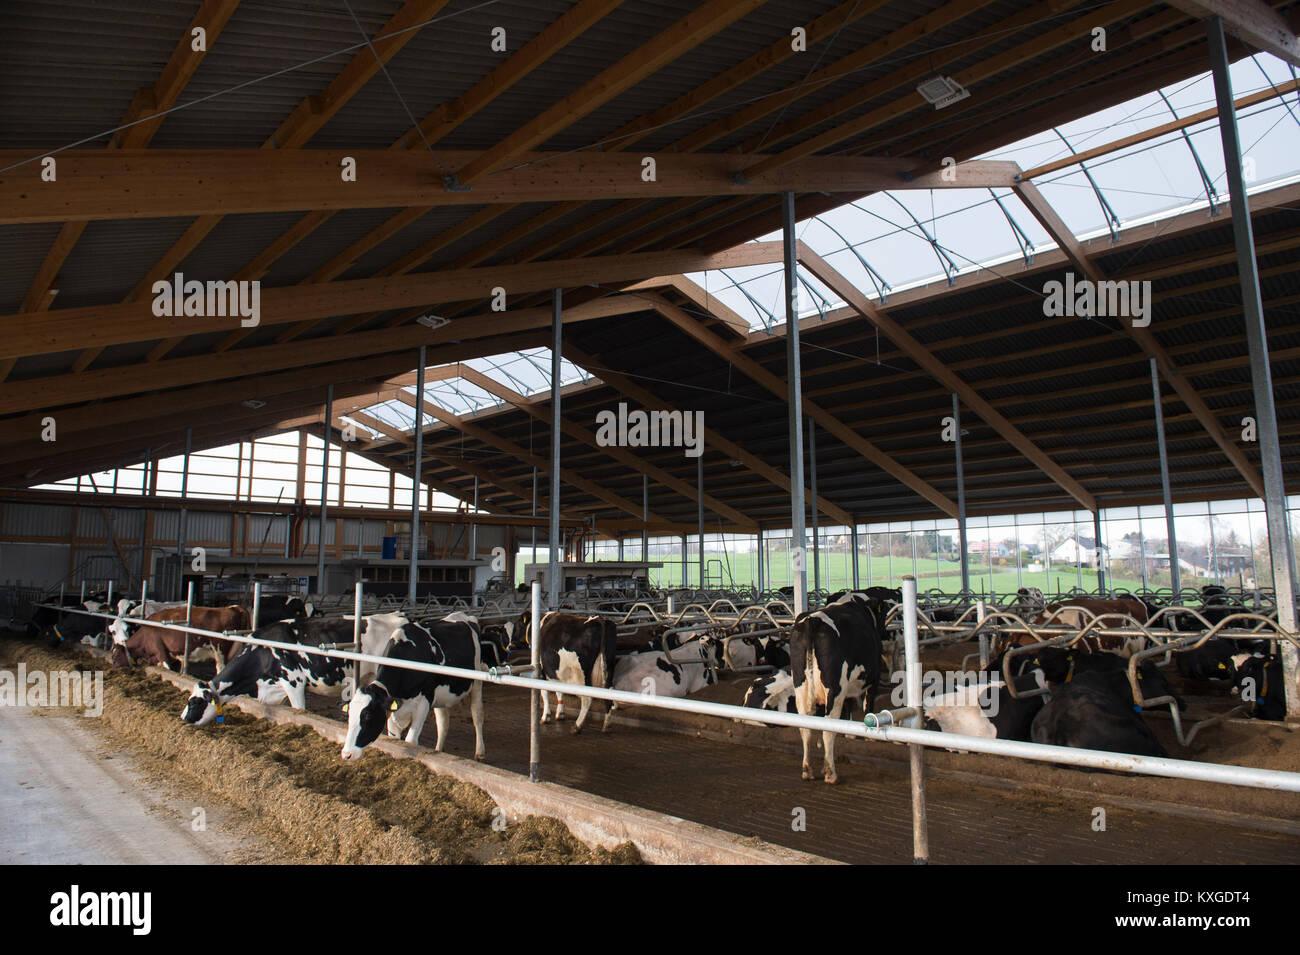 Neunkirchen-Seelscheid, Germany. 08th Jan, 2018. Farmer Marcel Andree's cows standing in a stall in Neunkirchen - Stock Image